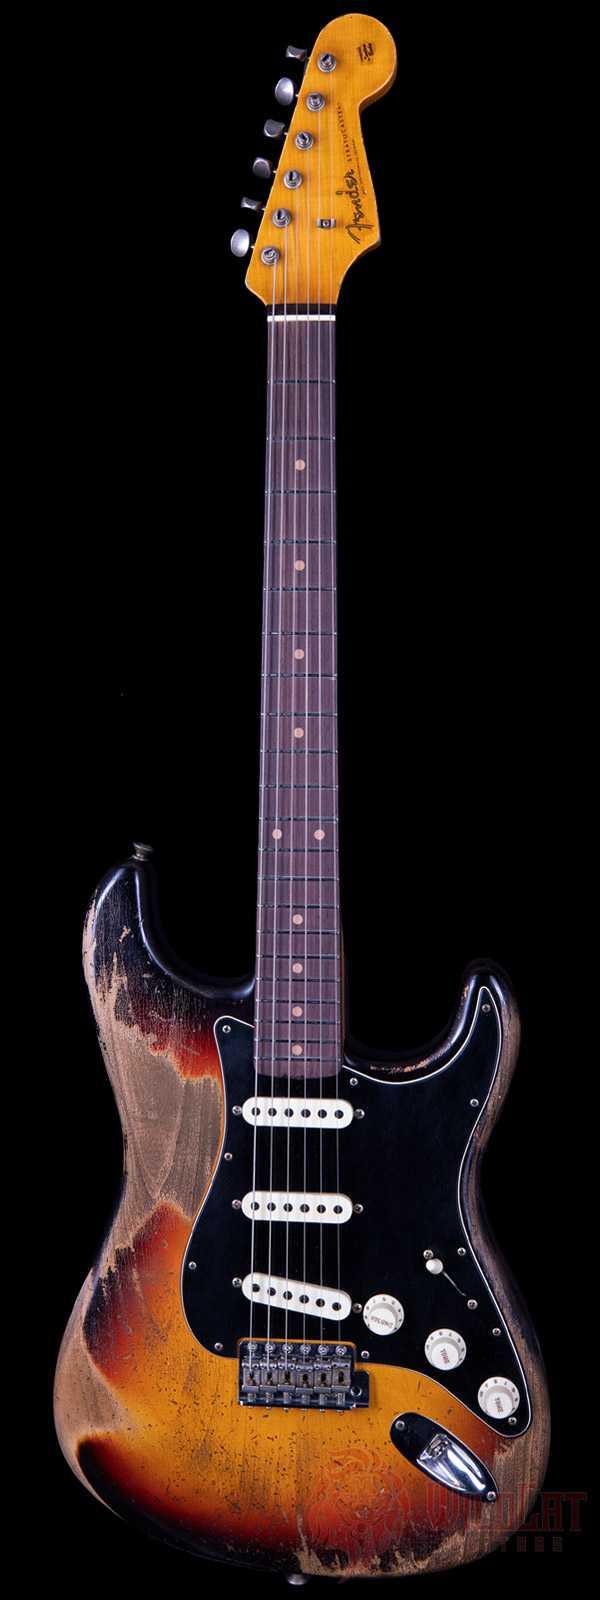 Fender Custom Shop Masterbuilt Kyle McMillin 1960 Stratocaster 3-Tone Sunburst Heavy Relic